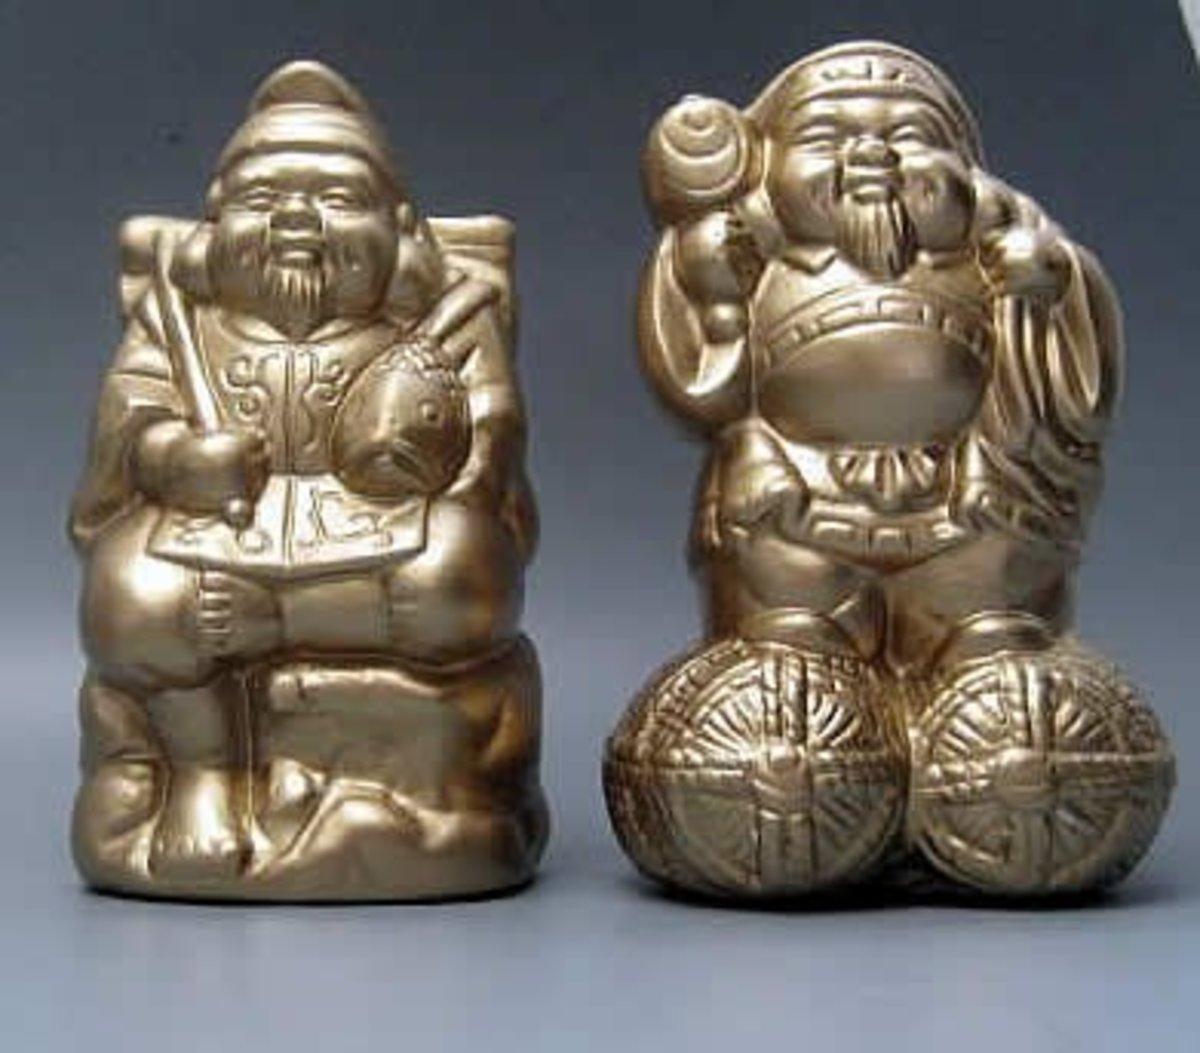 Ceramic statues of Ebisu and Daikokuten.